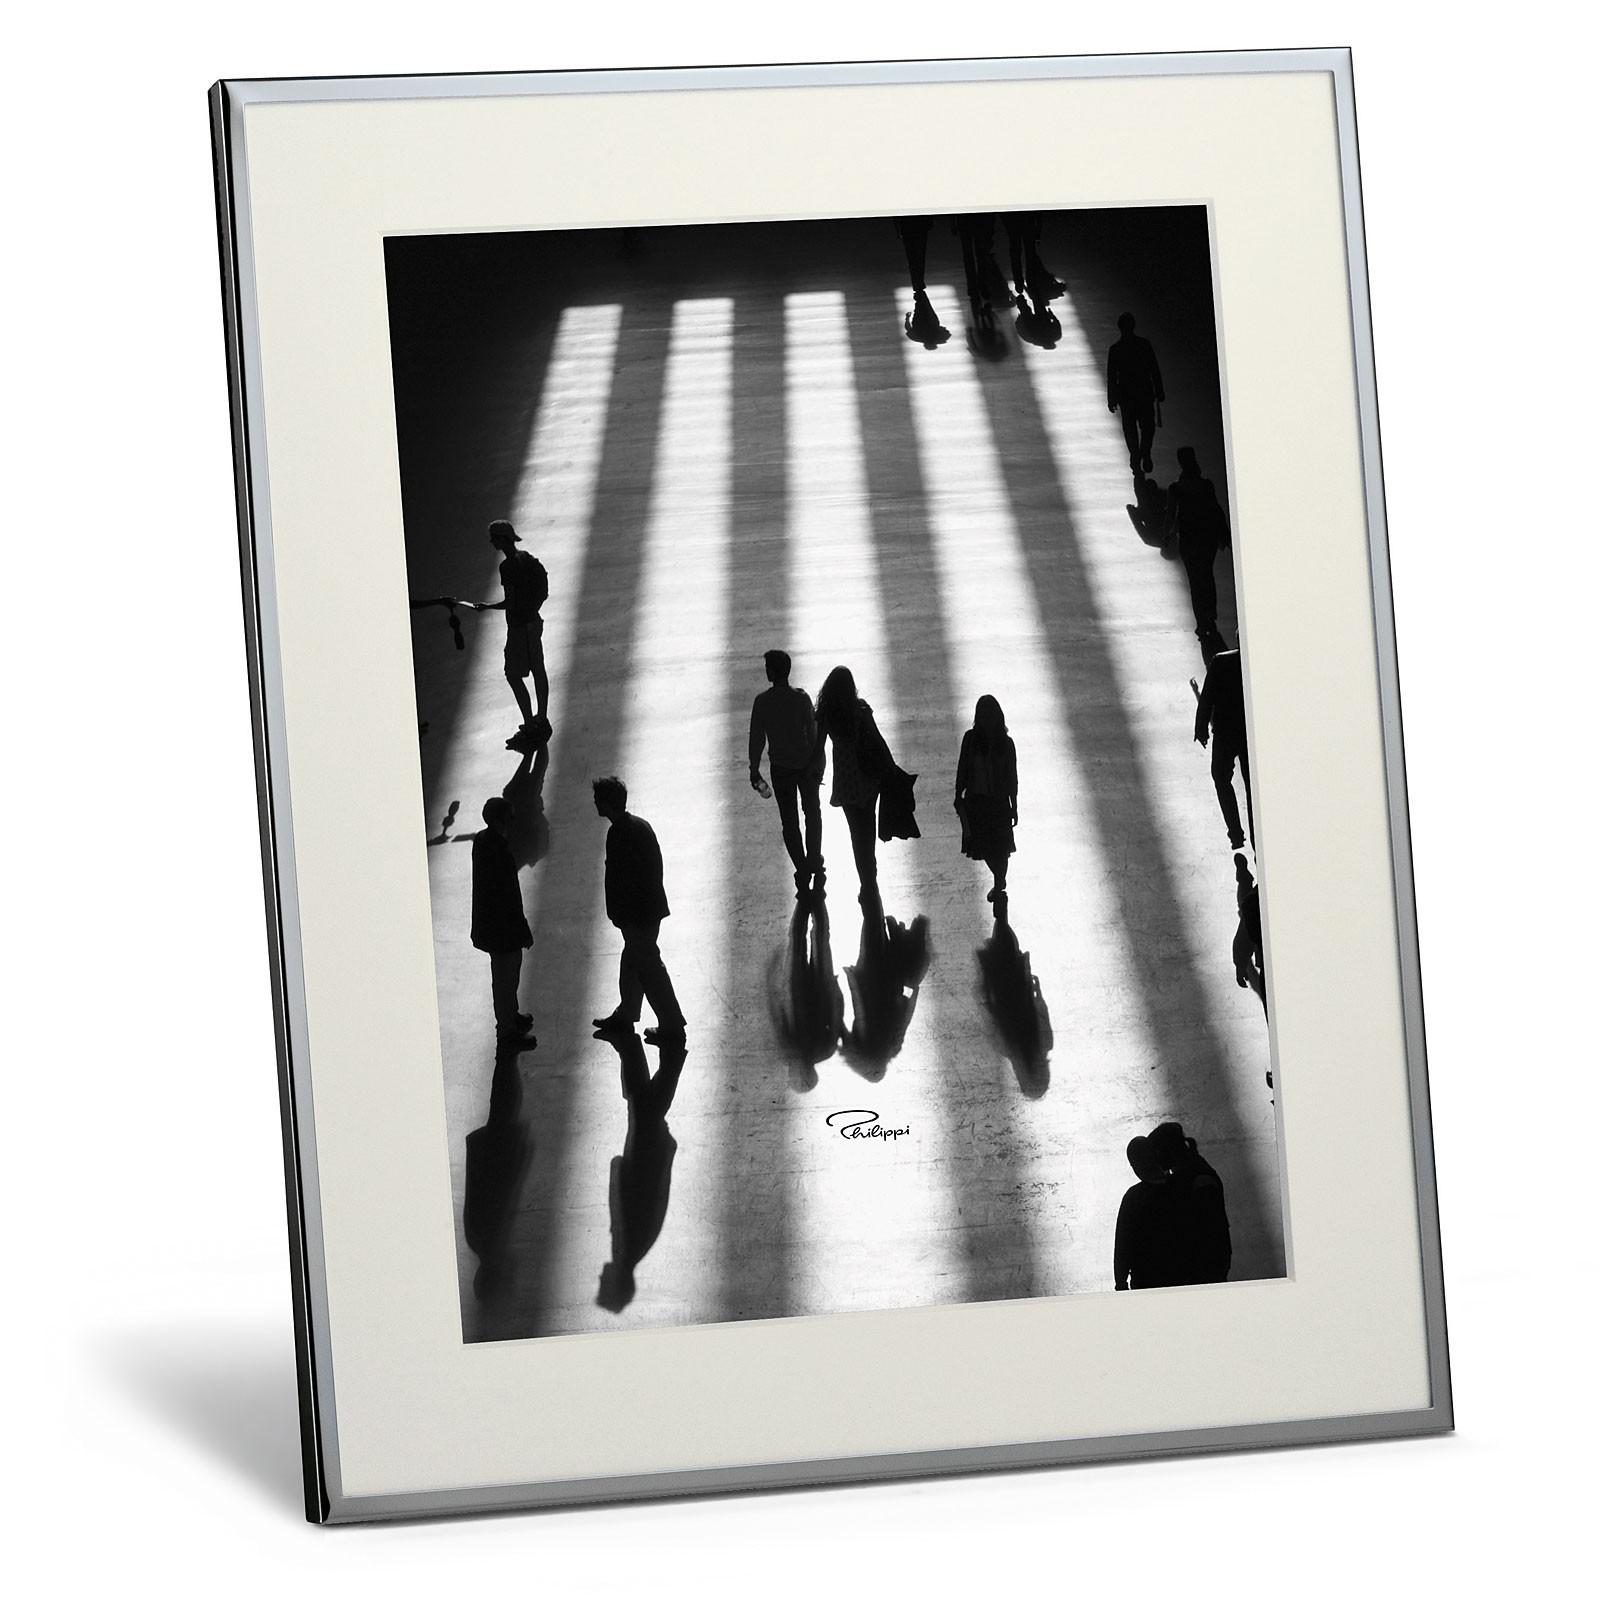 bilderrahmen chrom mit passepartout 20 x 25 cm philippi shadow. Black Bedroom Furniture Sets. Home Design Ideas